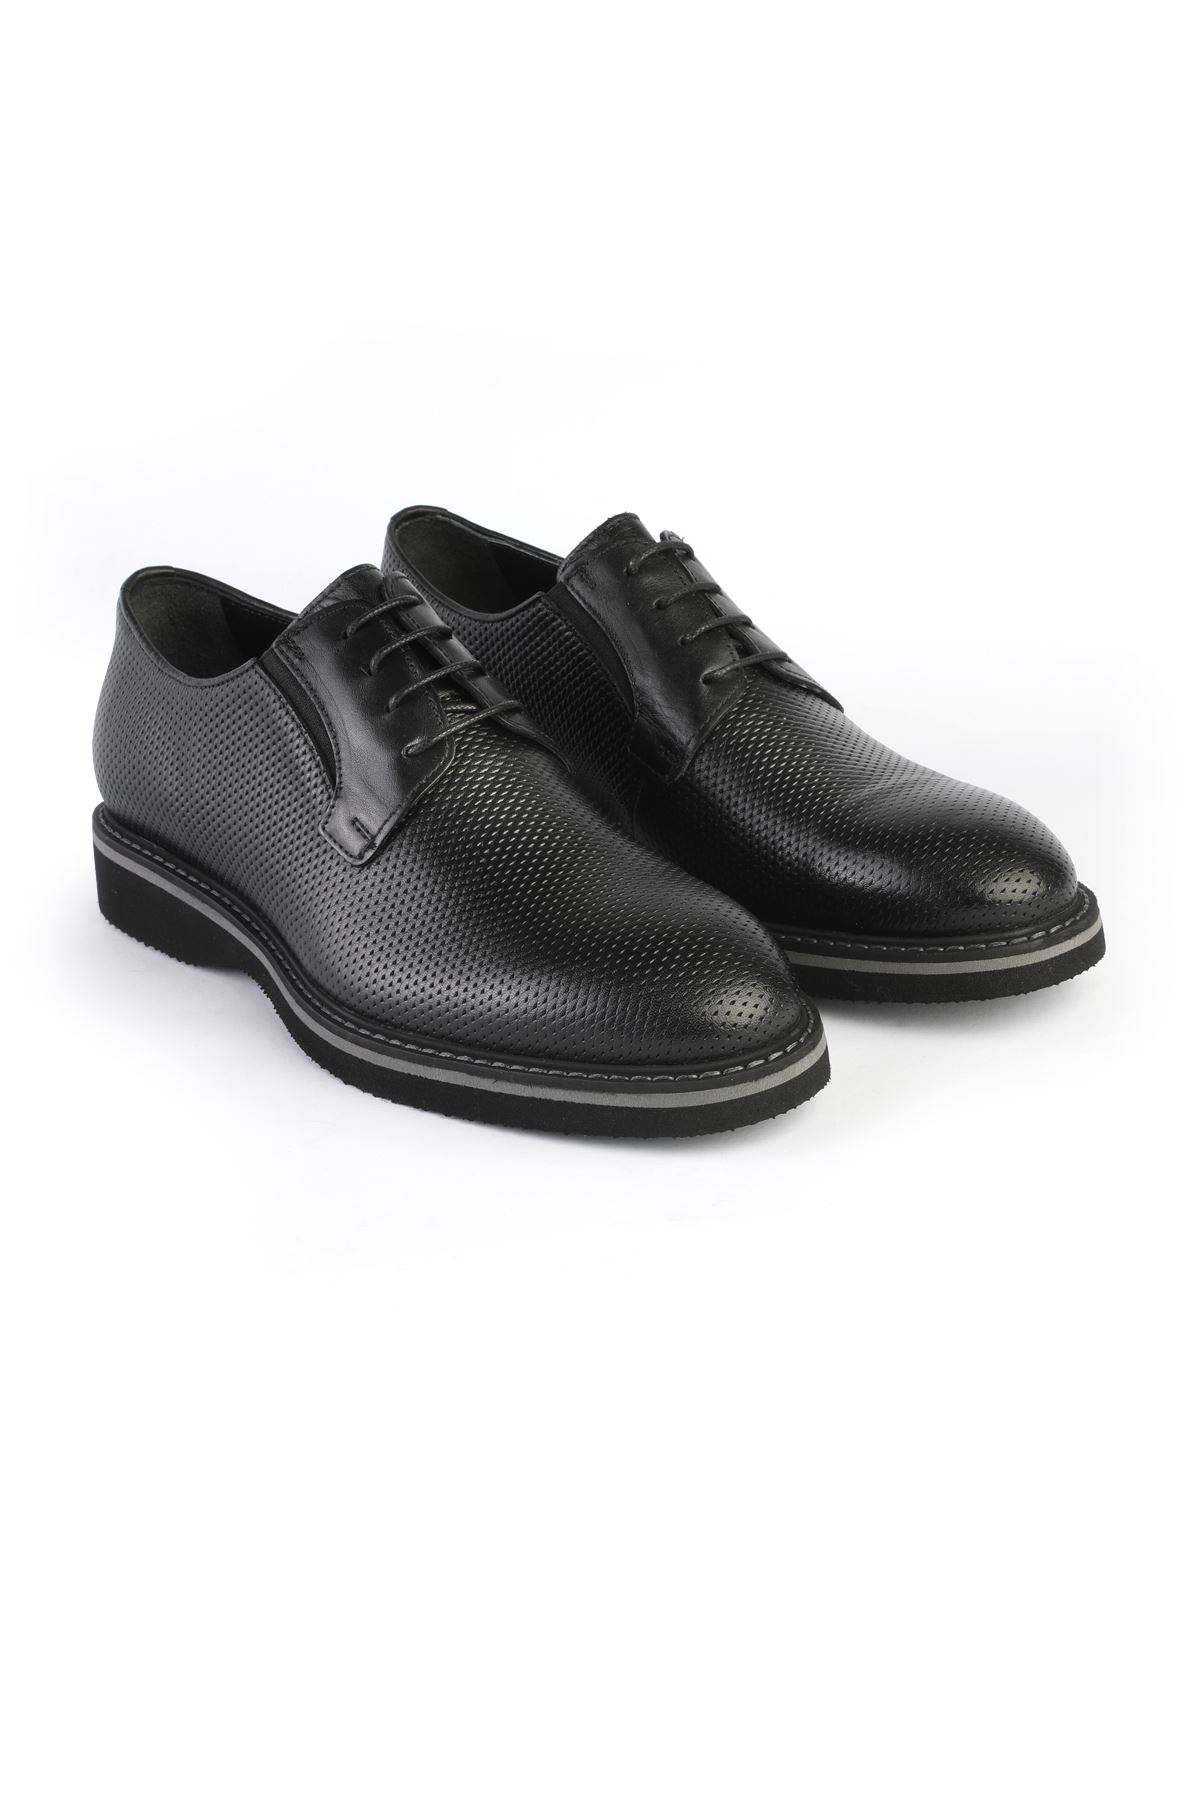 Libero 3261 Black Oxford Shoes